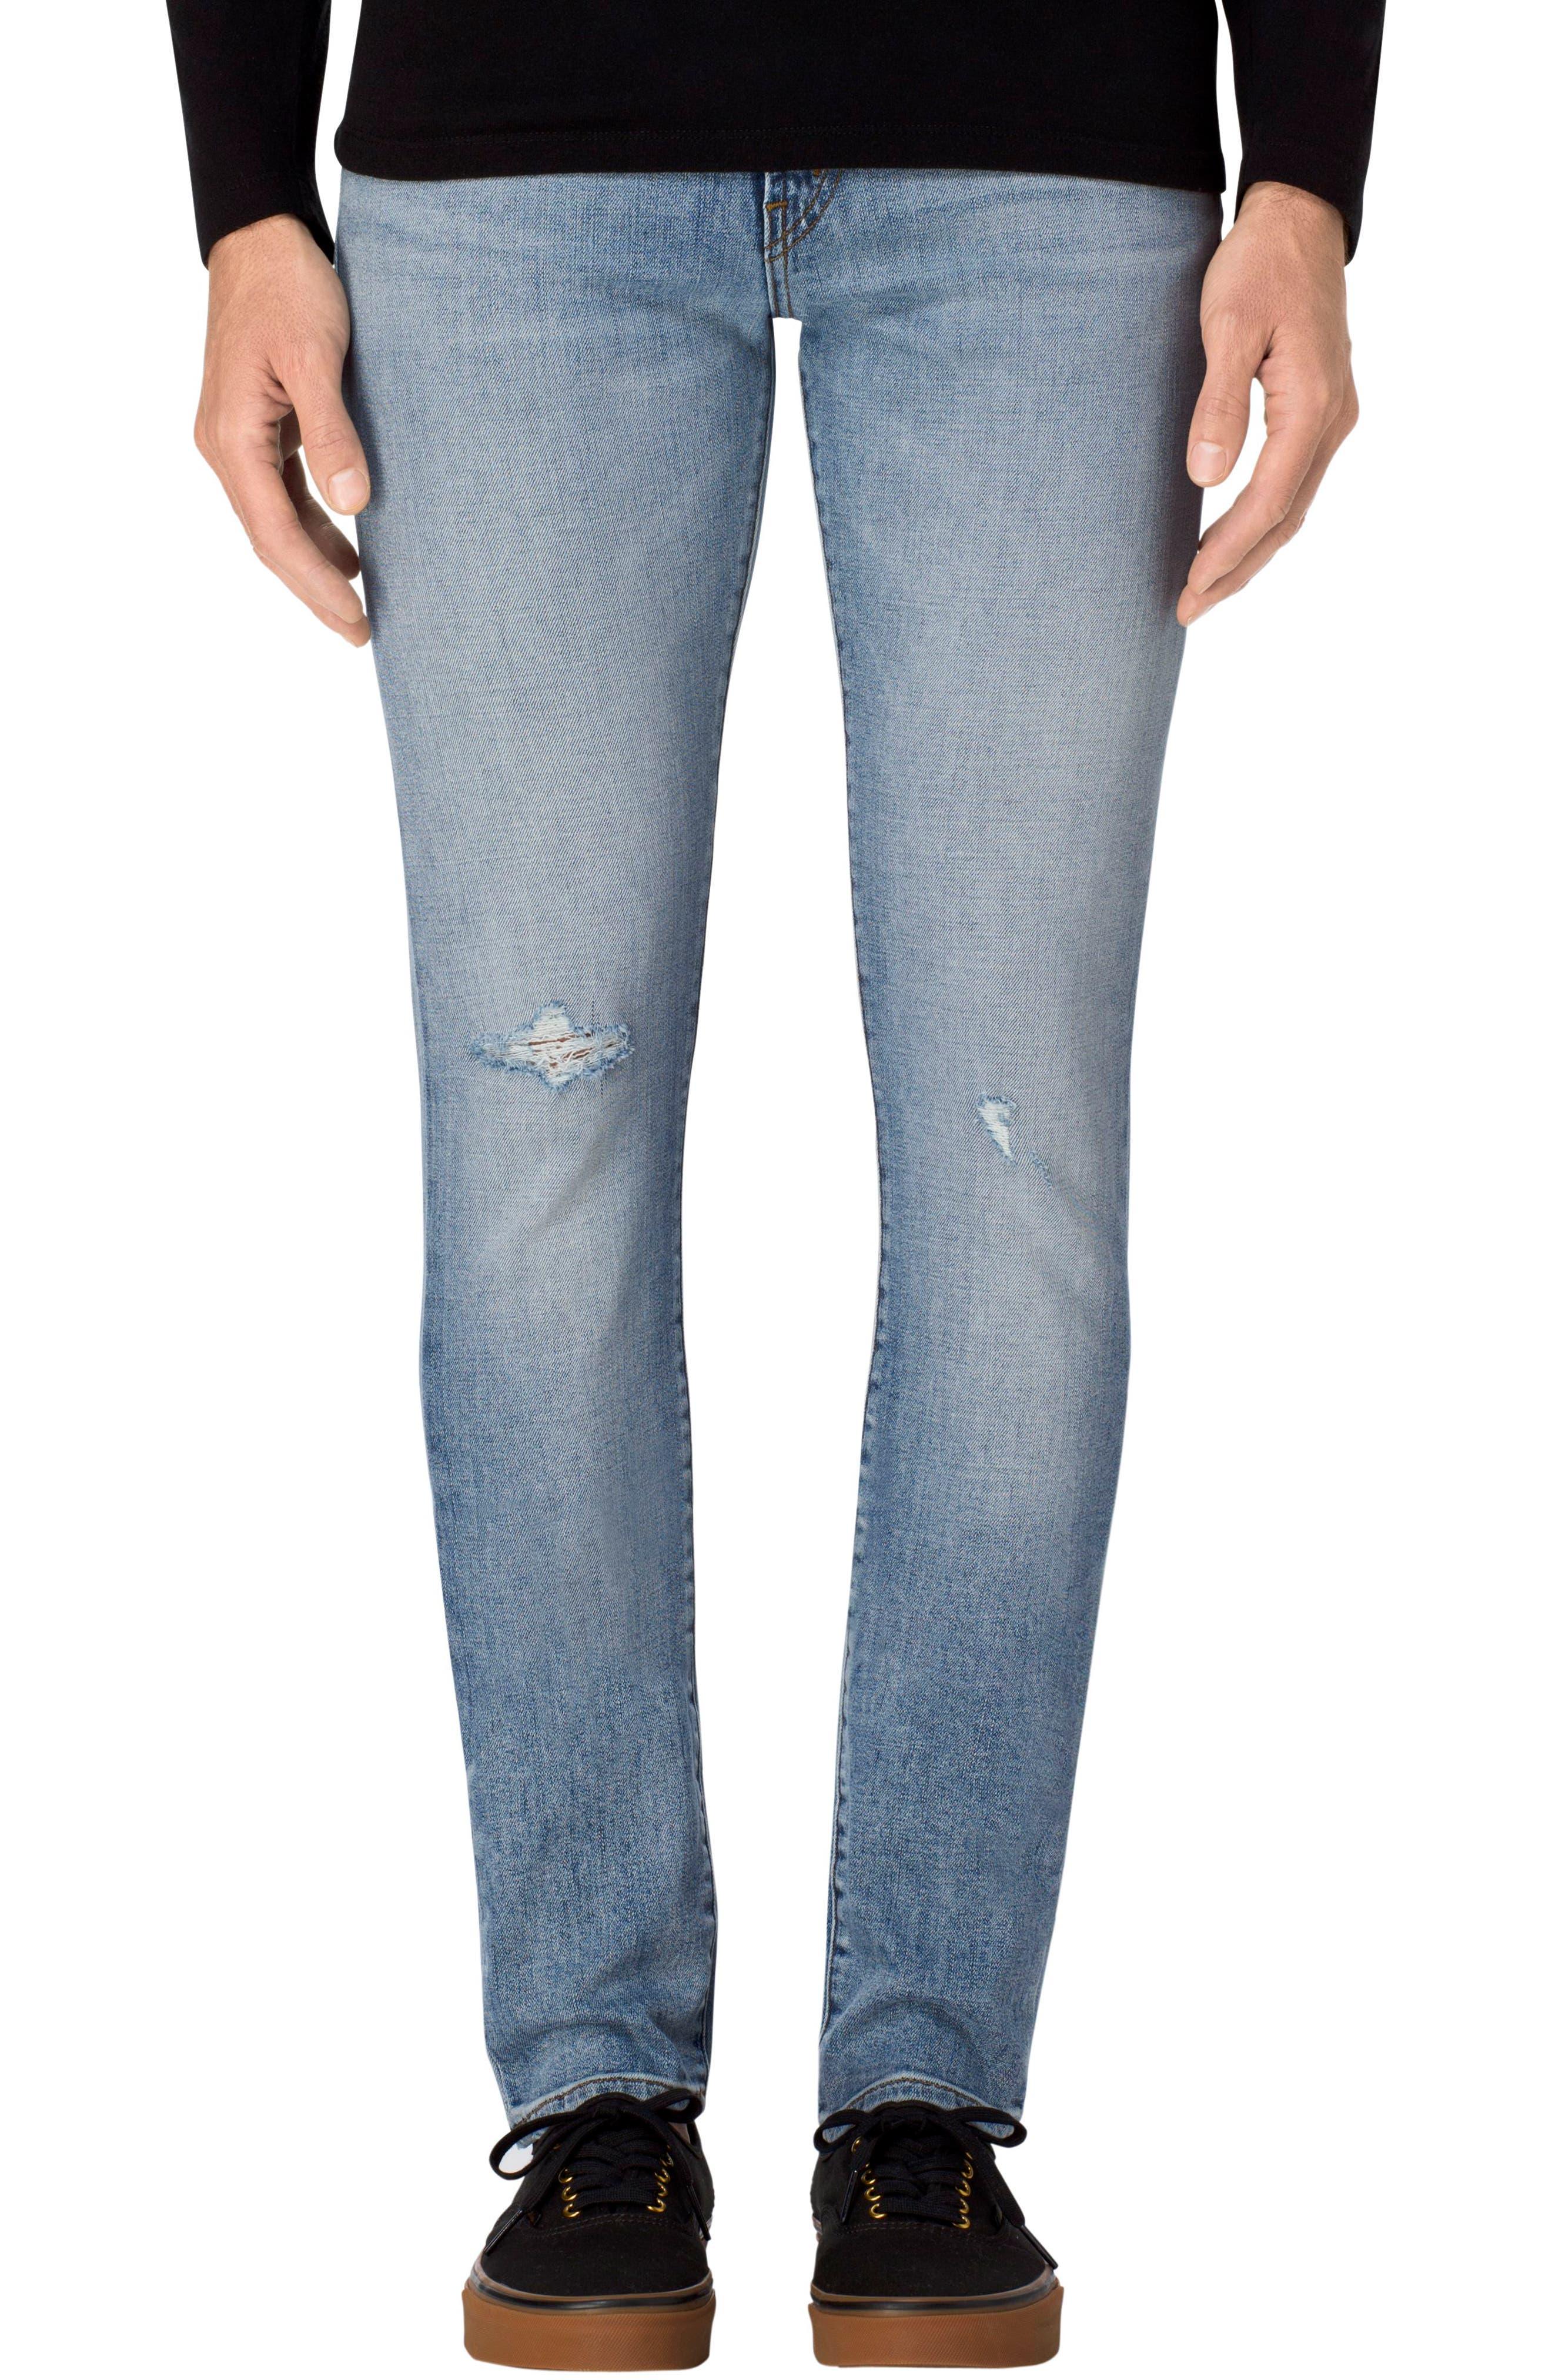 Mick Skinny Fit Jeans,                             Main thumbnail 1, color,                             450